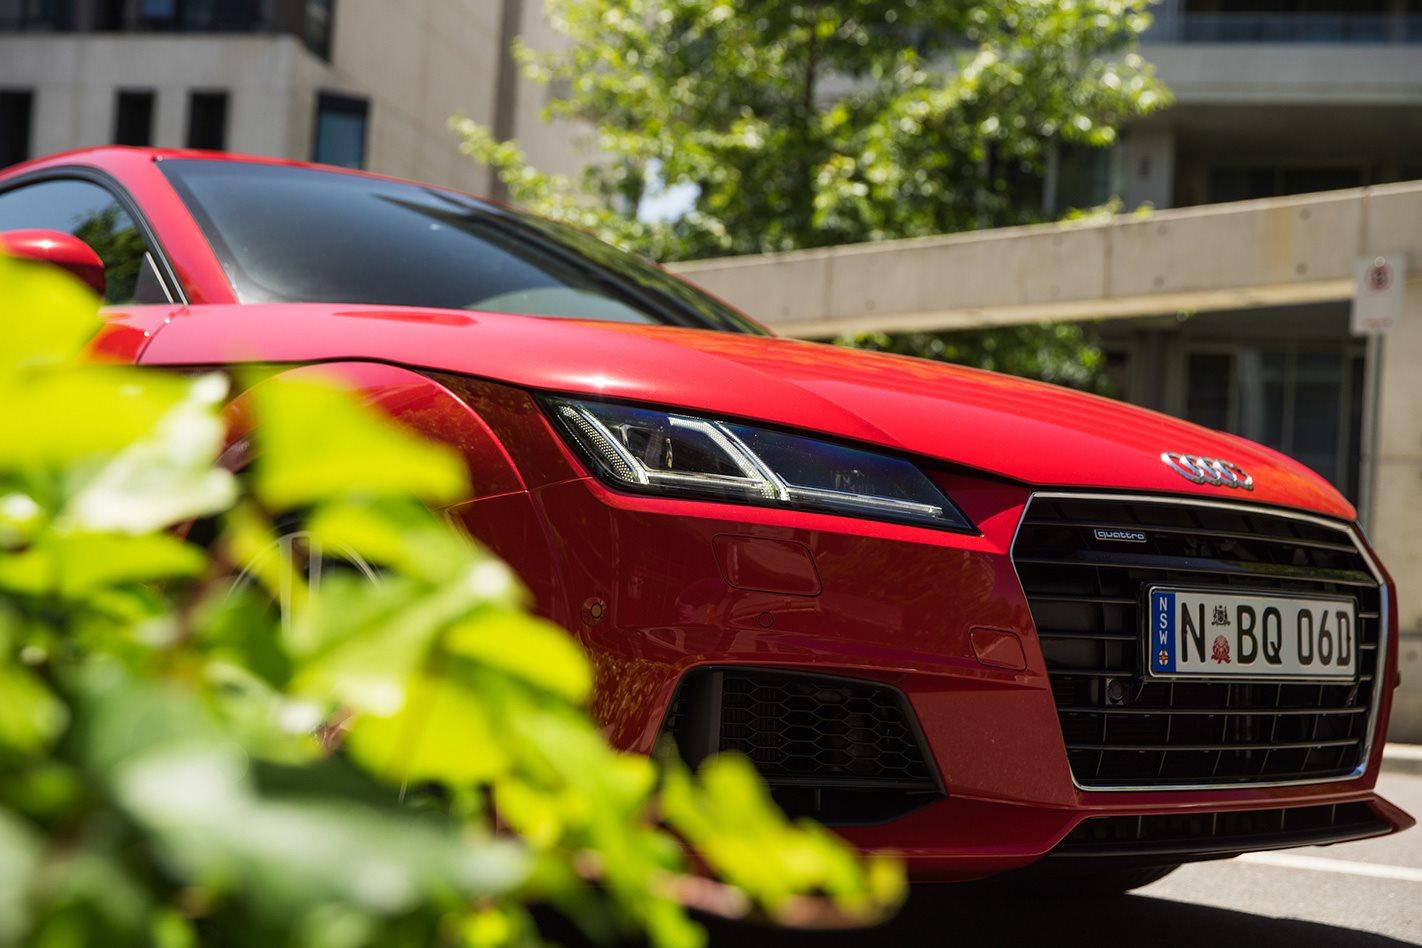 Hybrid Audi R8 front